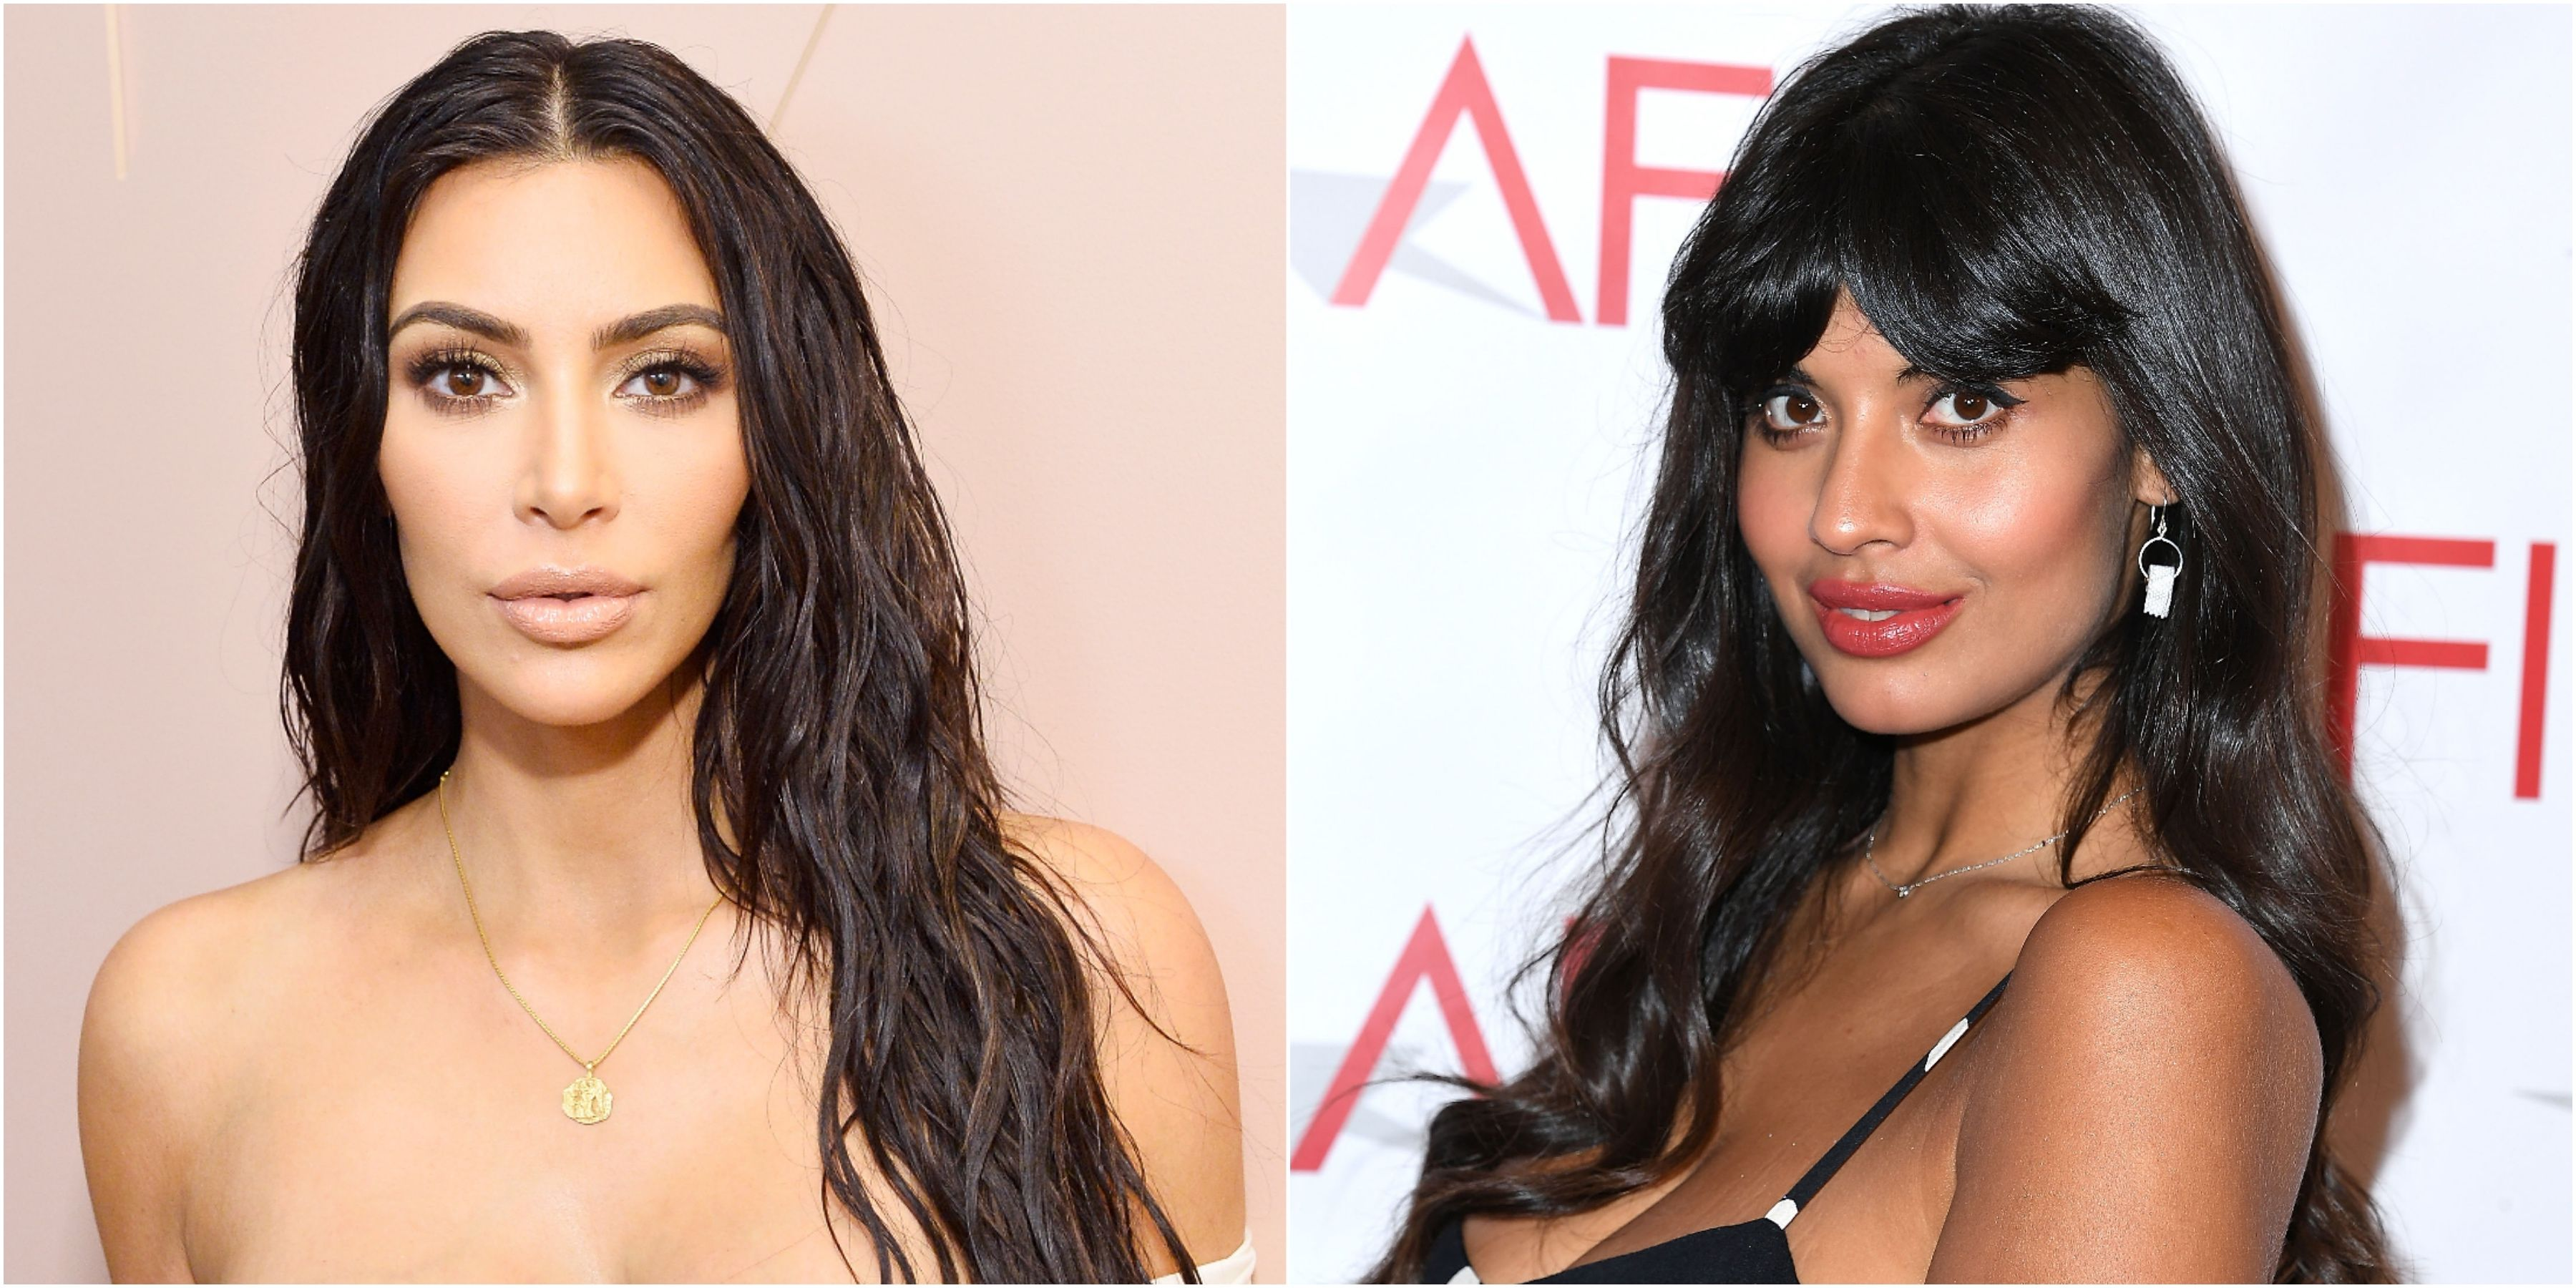 Jameela Jamil Kim Kardashian West